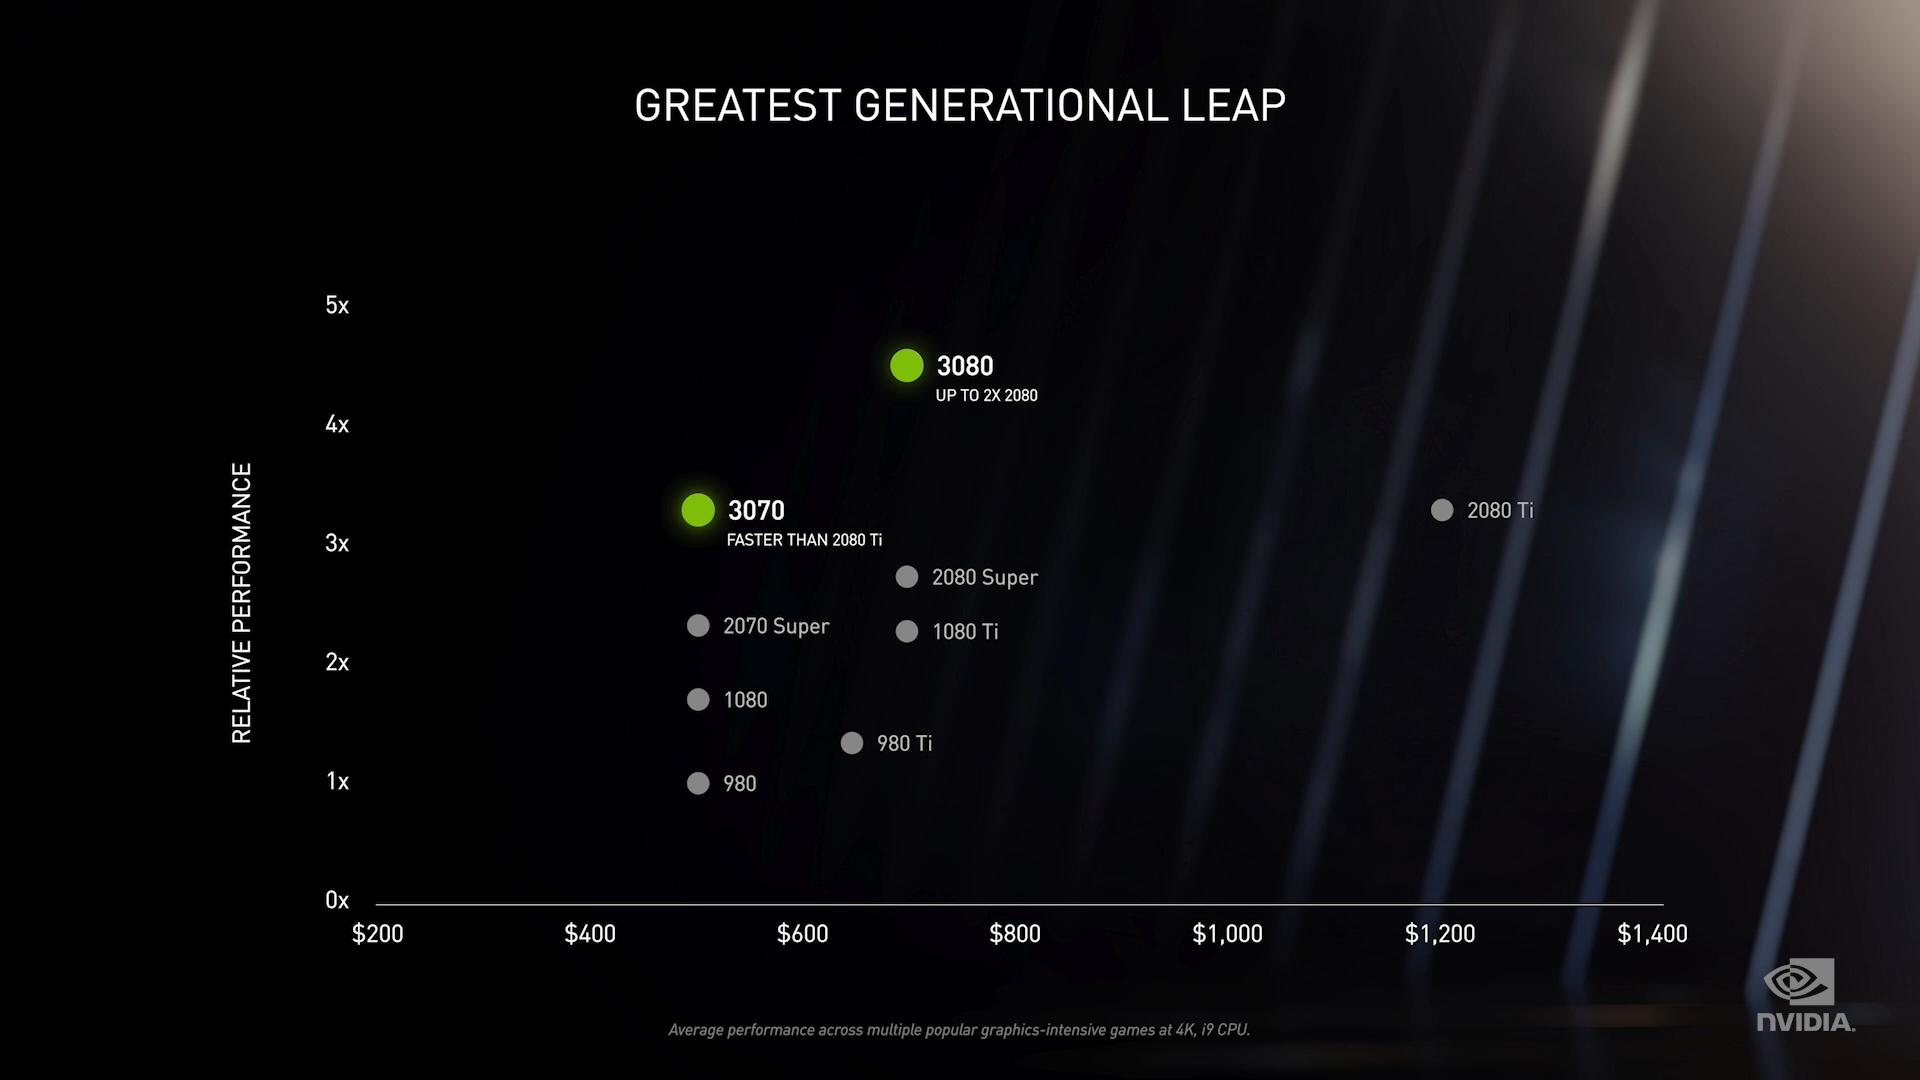 NVIDIA announces the 2nd generation RTX 3090, RTX 3080, RTX 3070